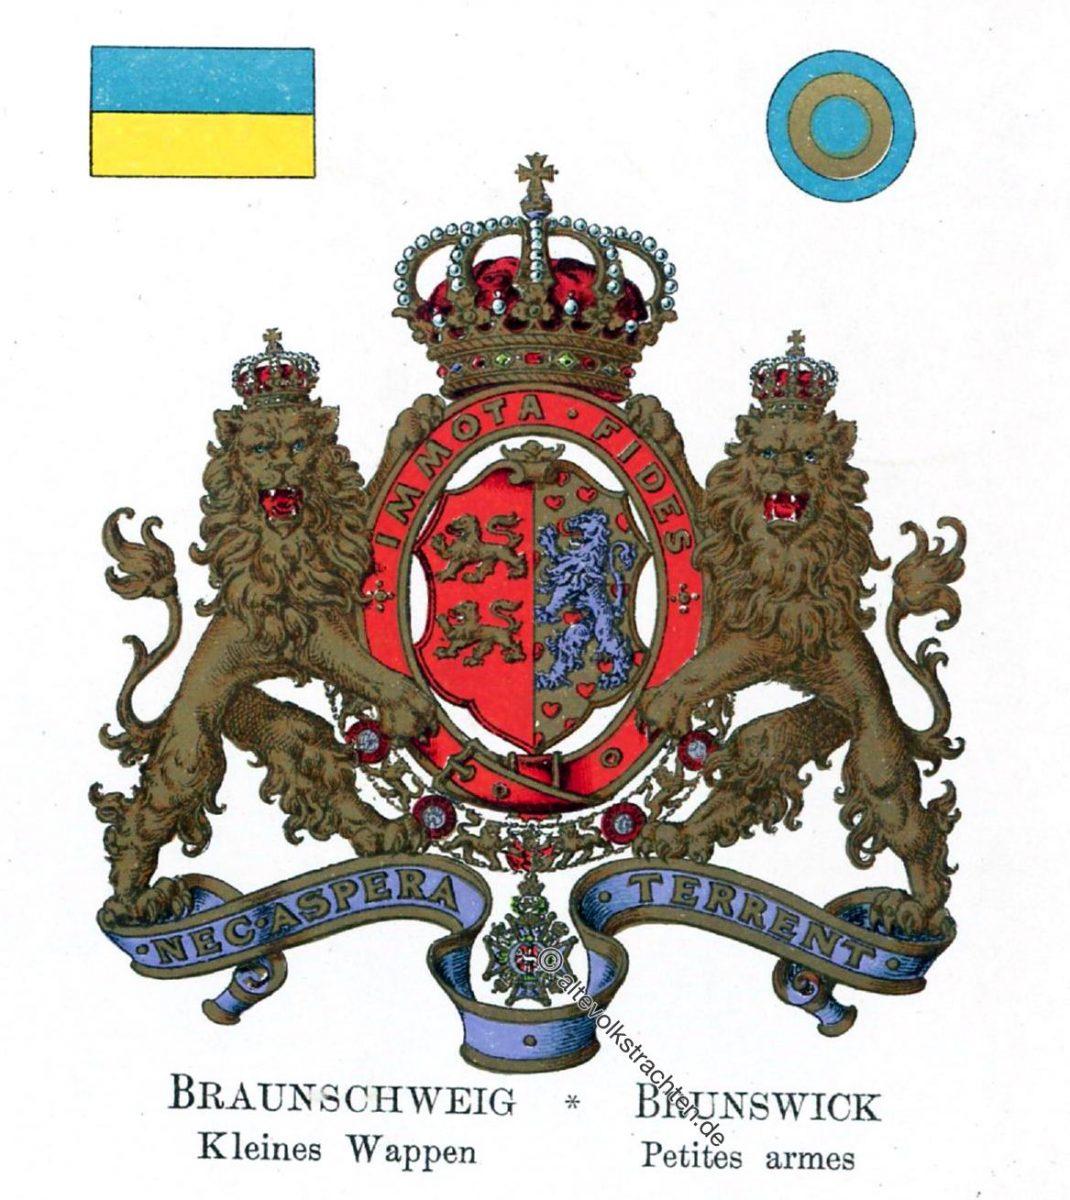 Braunschweig, Kleines Wappen, Staatswappen, Wappen, Heraldik, Deutschland, Landesflaggen, Cocarden, heraldry, héraldique, armoiries,